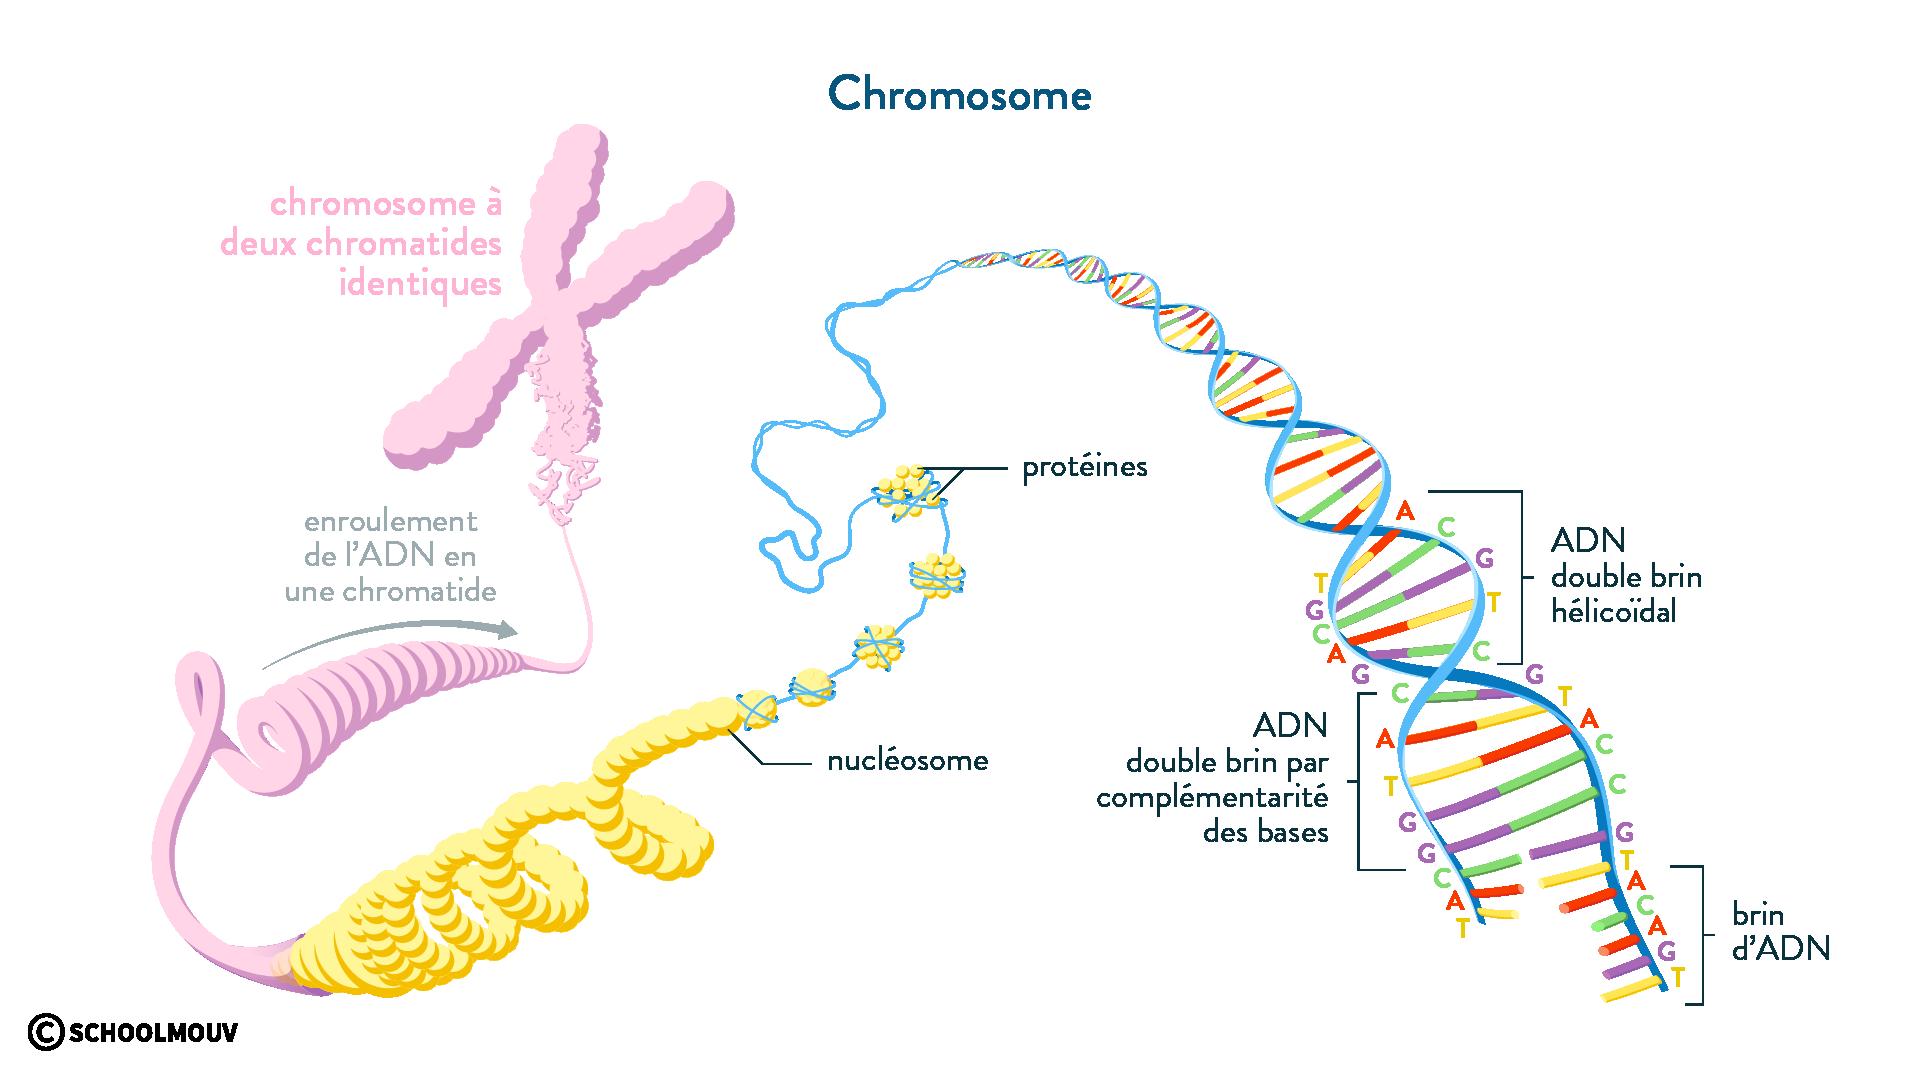 chromosome ADN double brin hélicoïdal chromatide nucléosome protéines